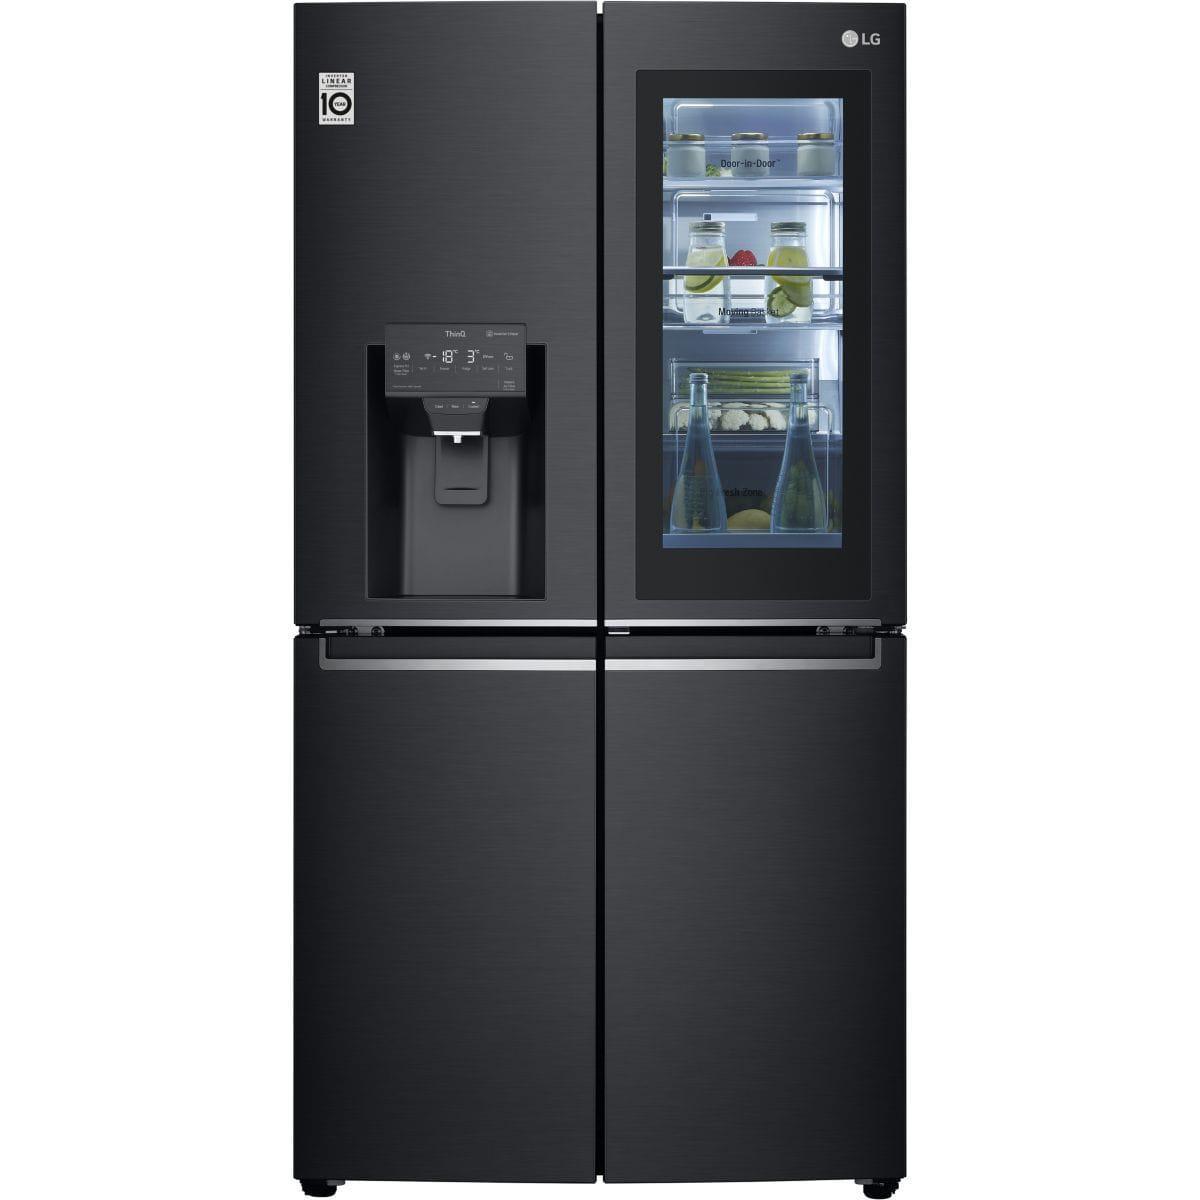 Photo Réfrigérateur Américain LG GMX945MC9F